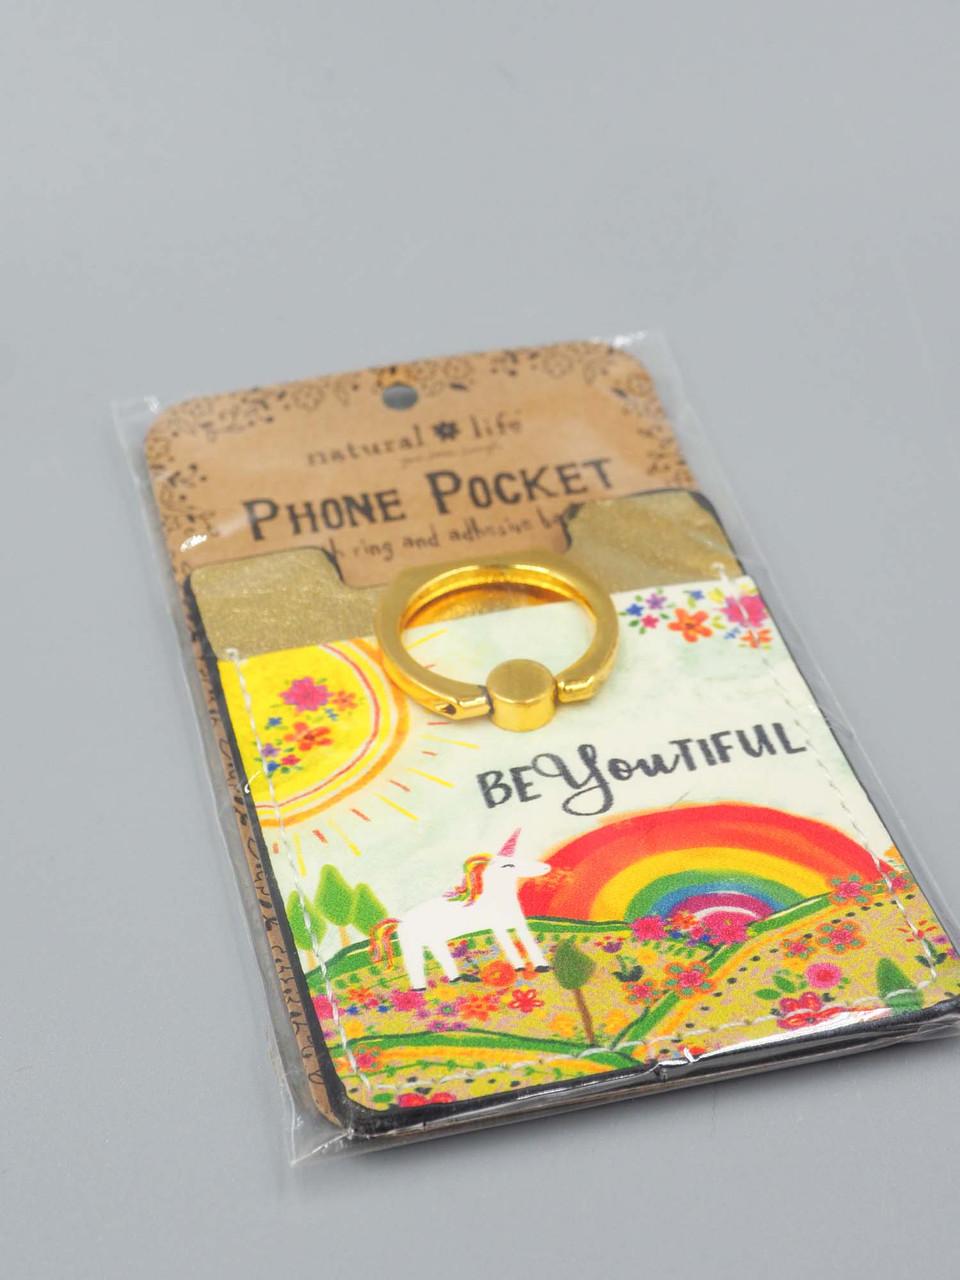 beyoutiful you phone pocket ring natural life